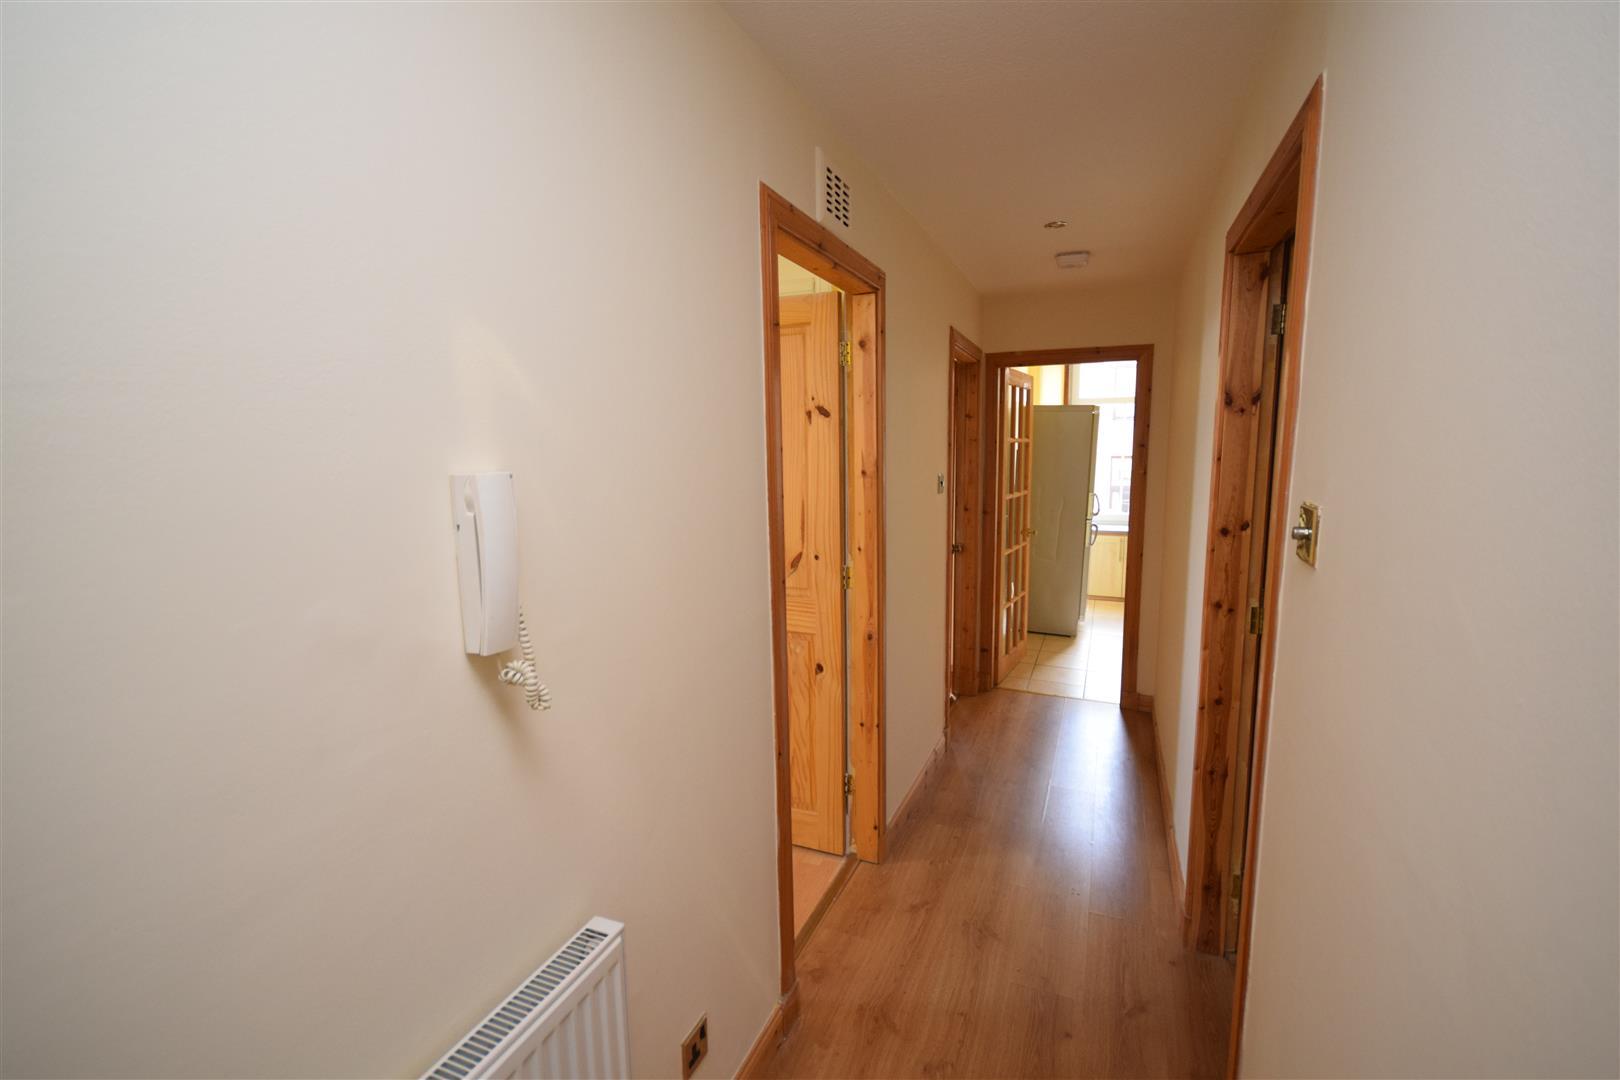 Flat 4, 61, Princes Street, Perth, Perthshire, PH2 8LJ, UK